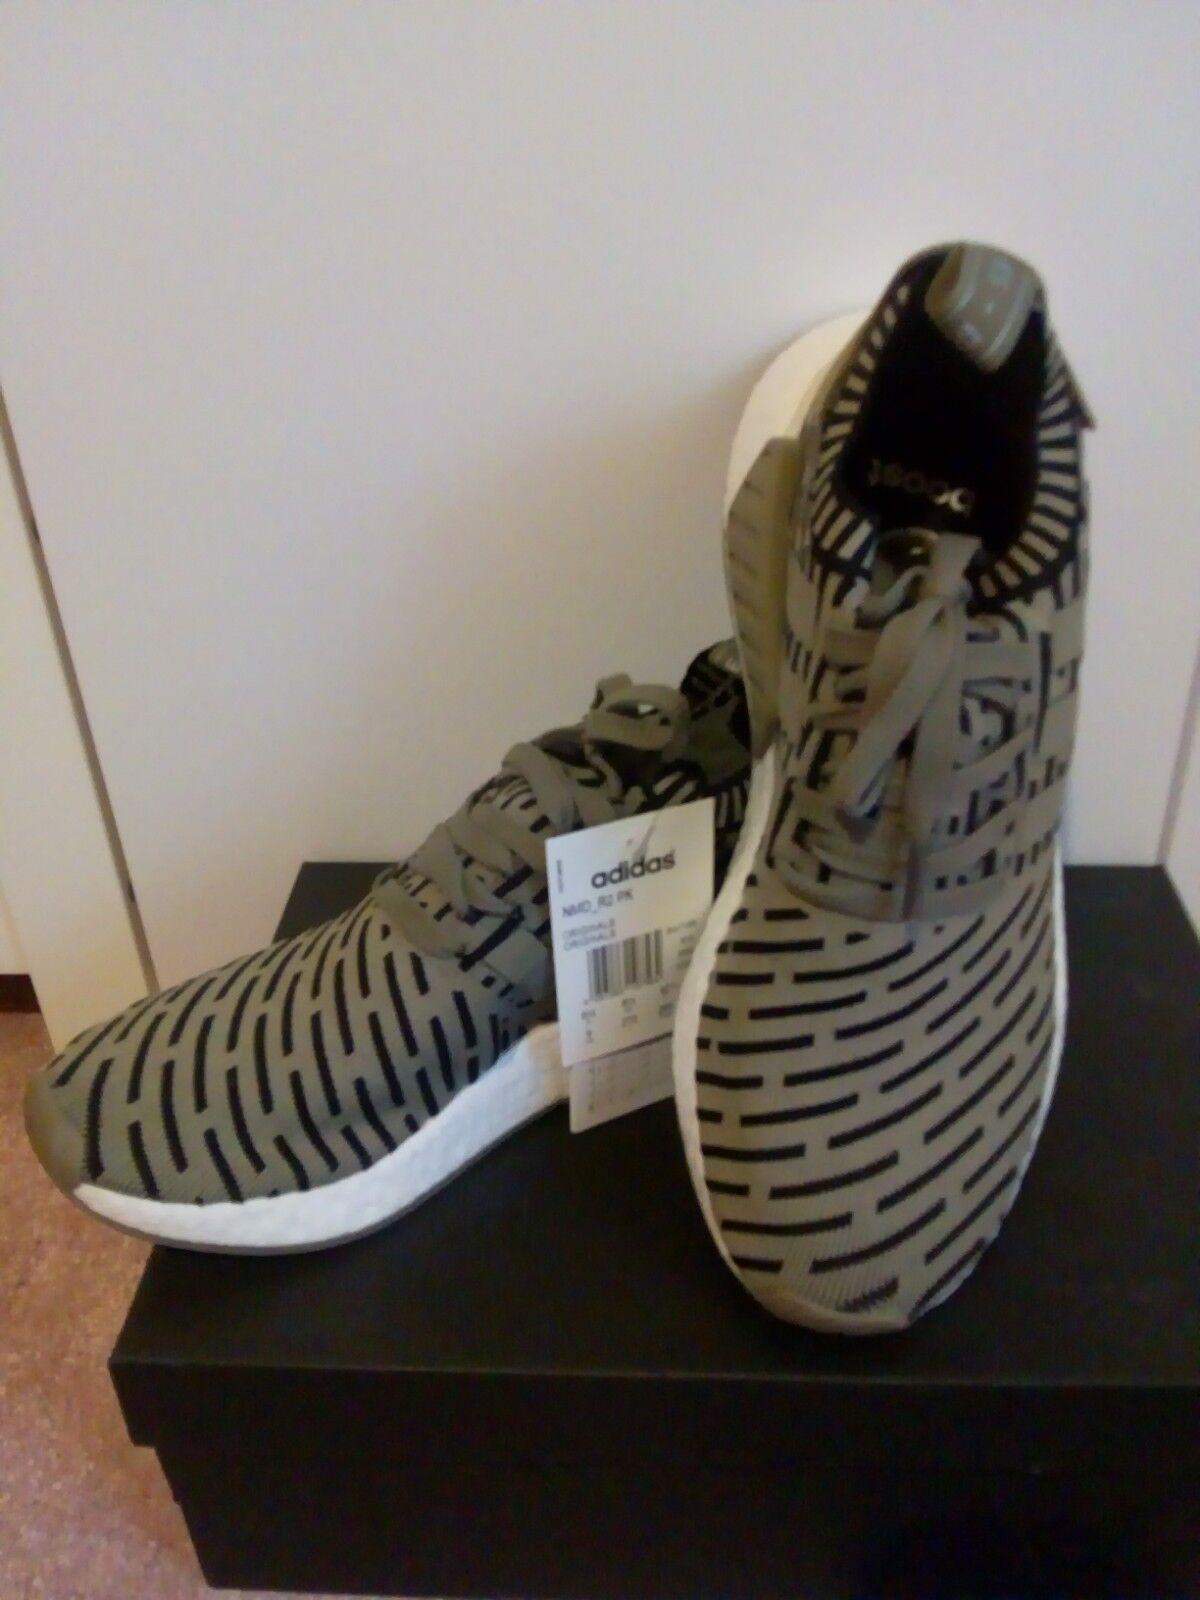 Adidas Originals, NMD R2 PK, BA7198 premier tricot UK8, 5, US9